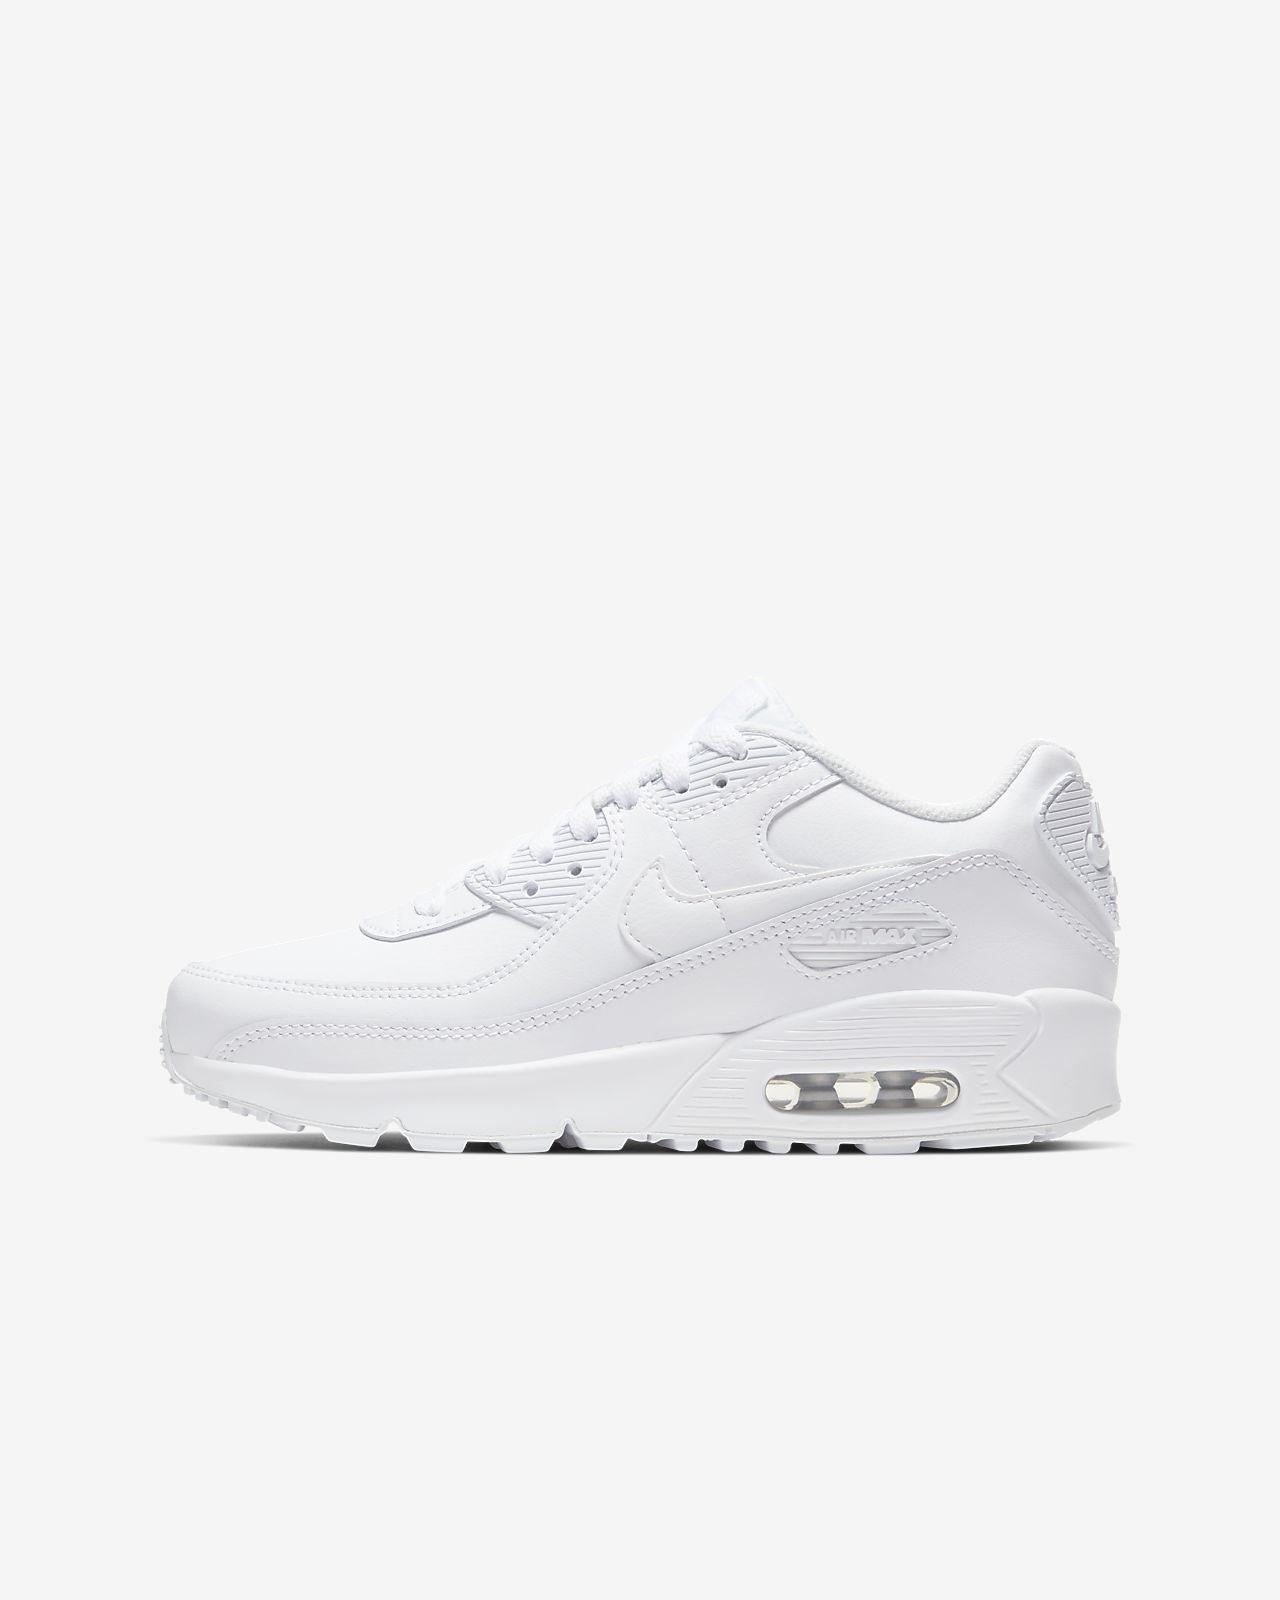 Nike Selber Erstellen